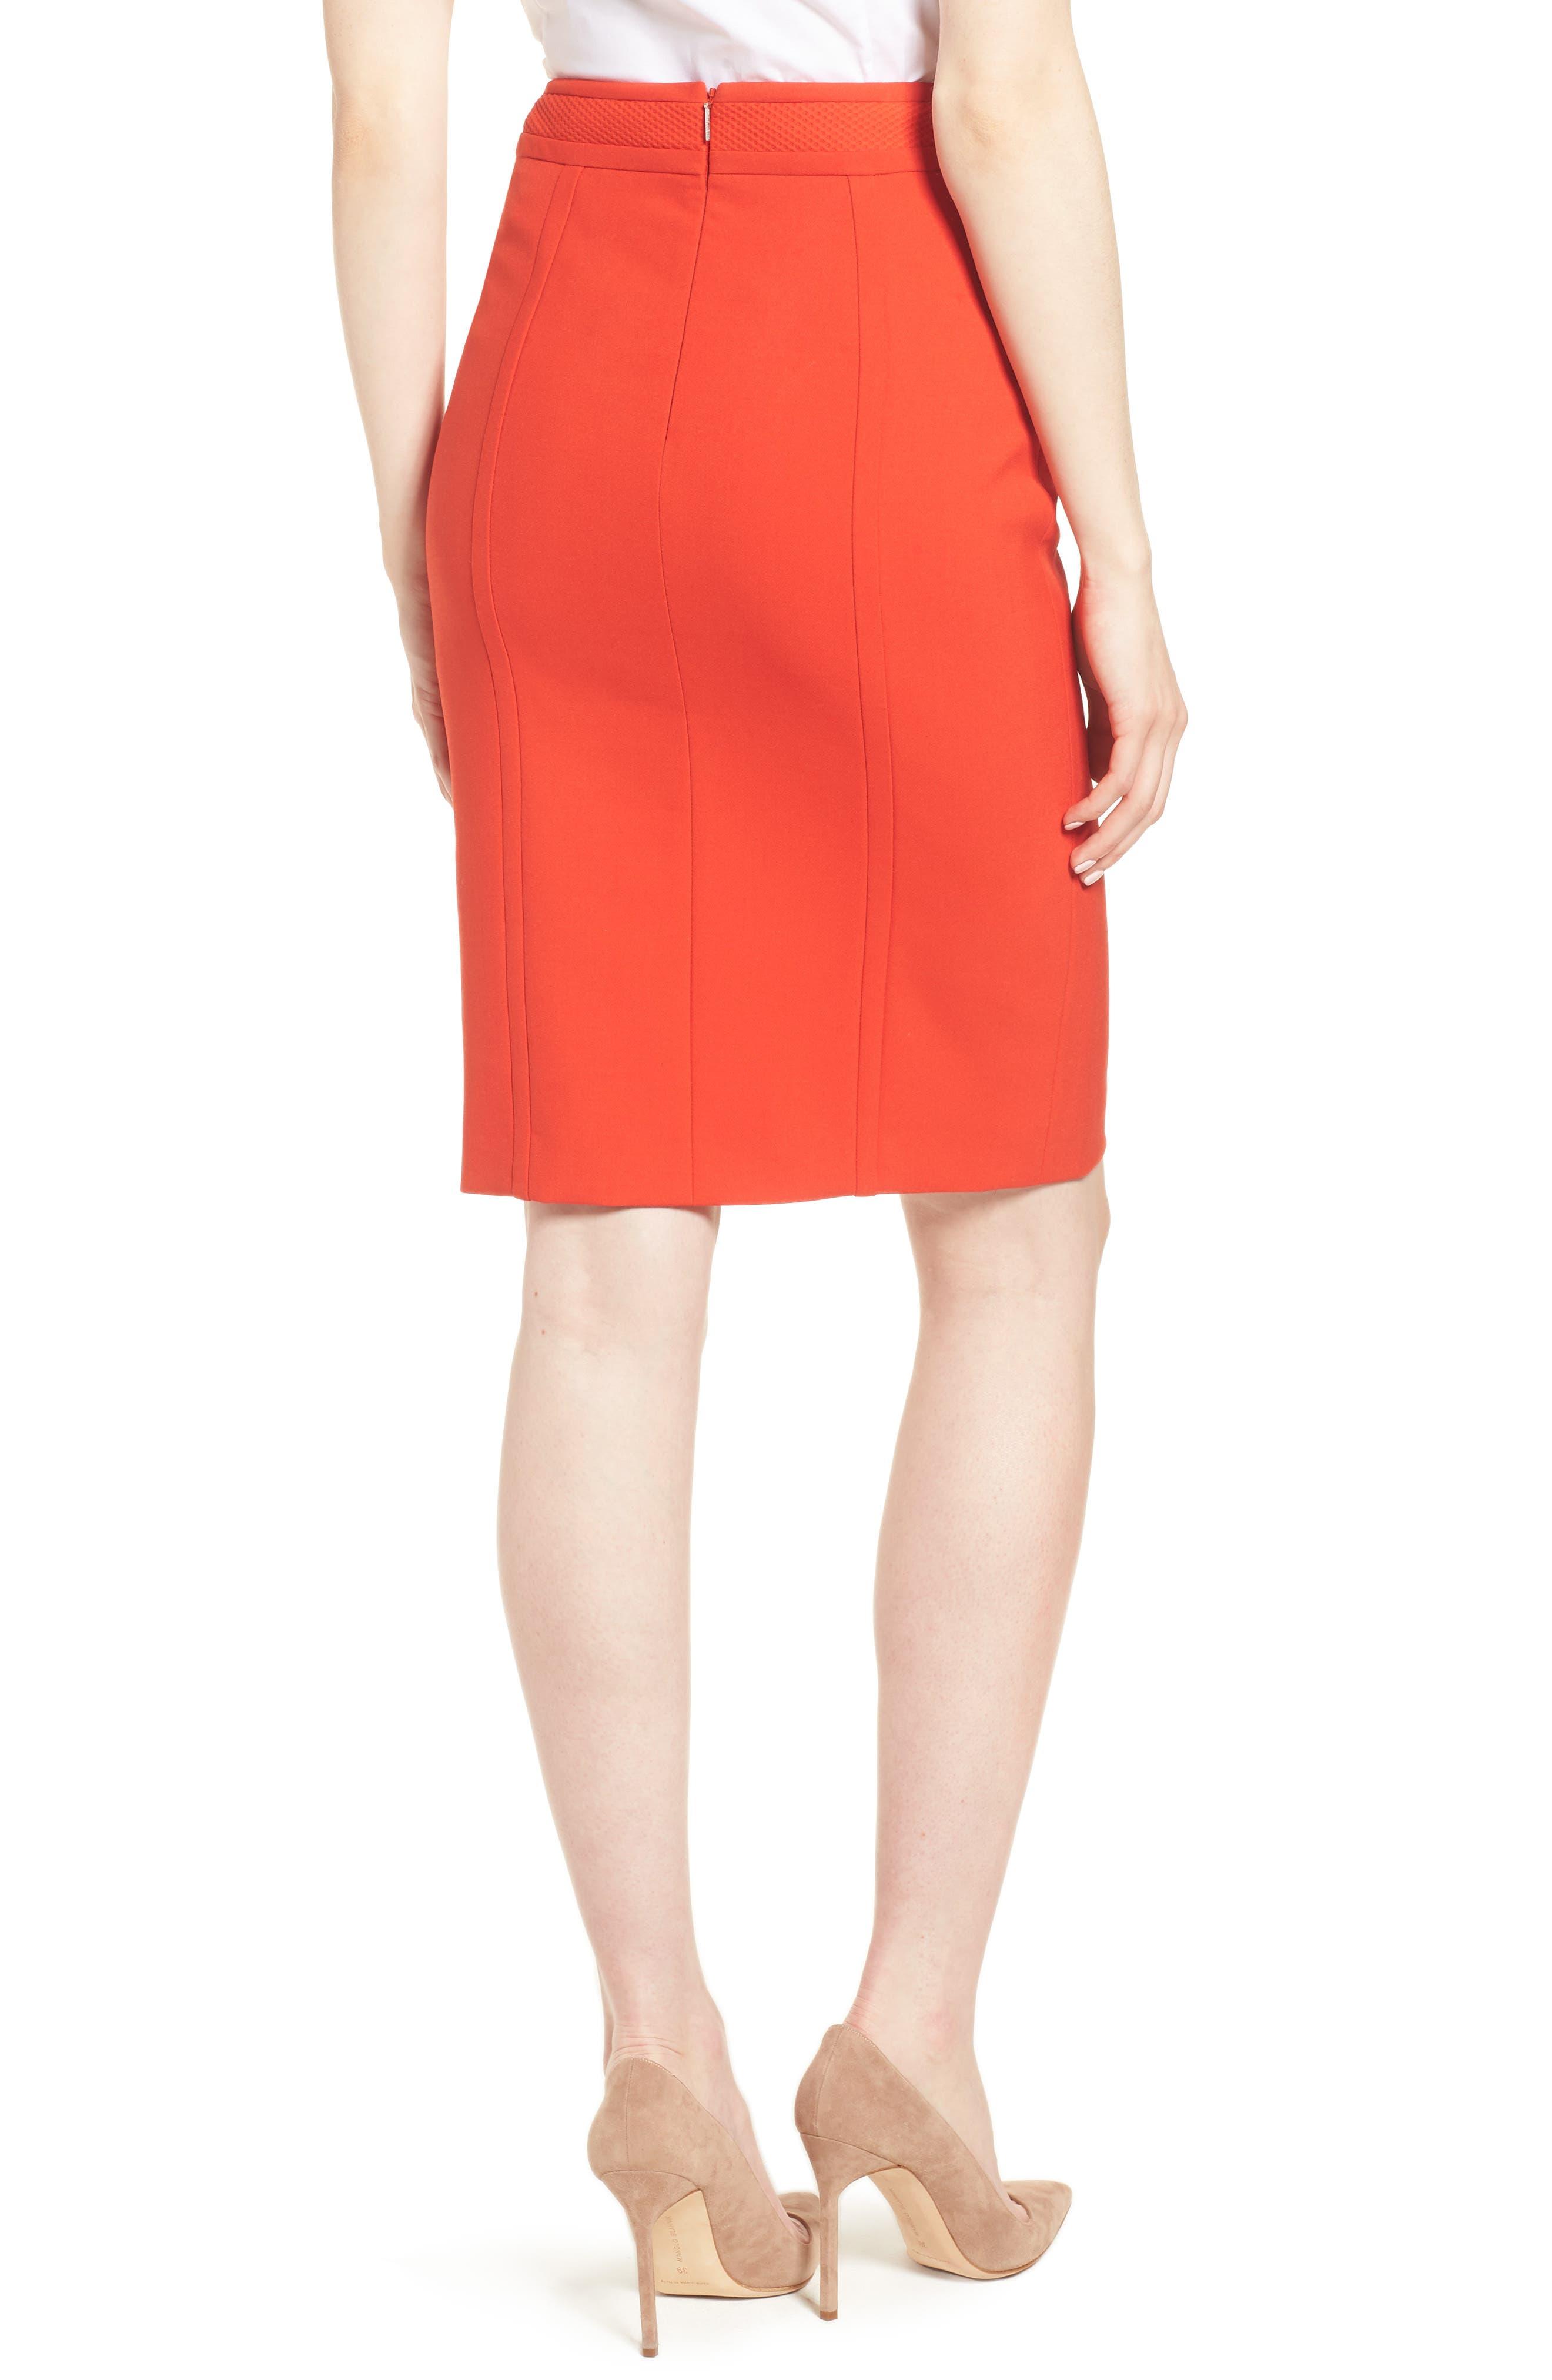 Vadama Ponte Pencil Skirt,                             Alternate thumbnail 2, color,